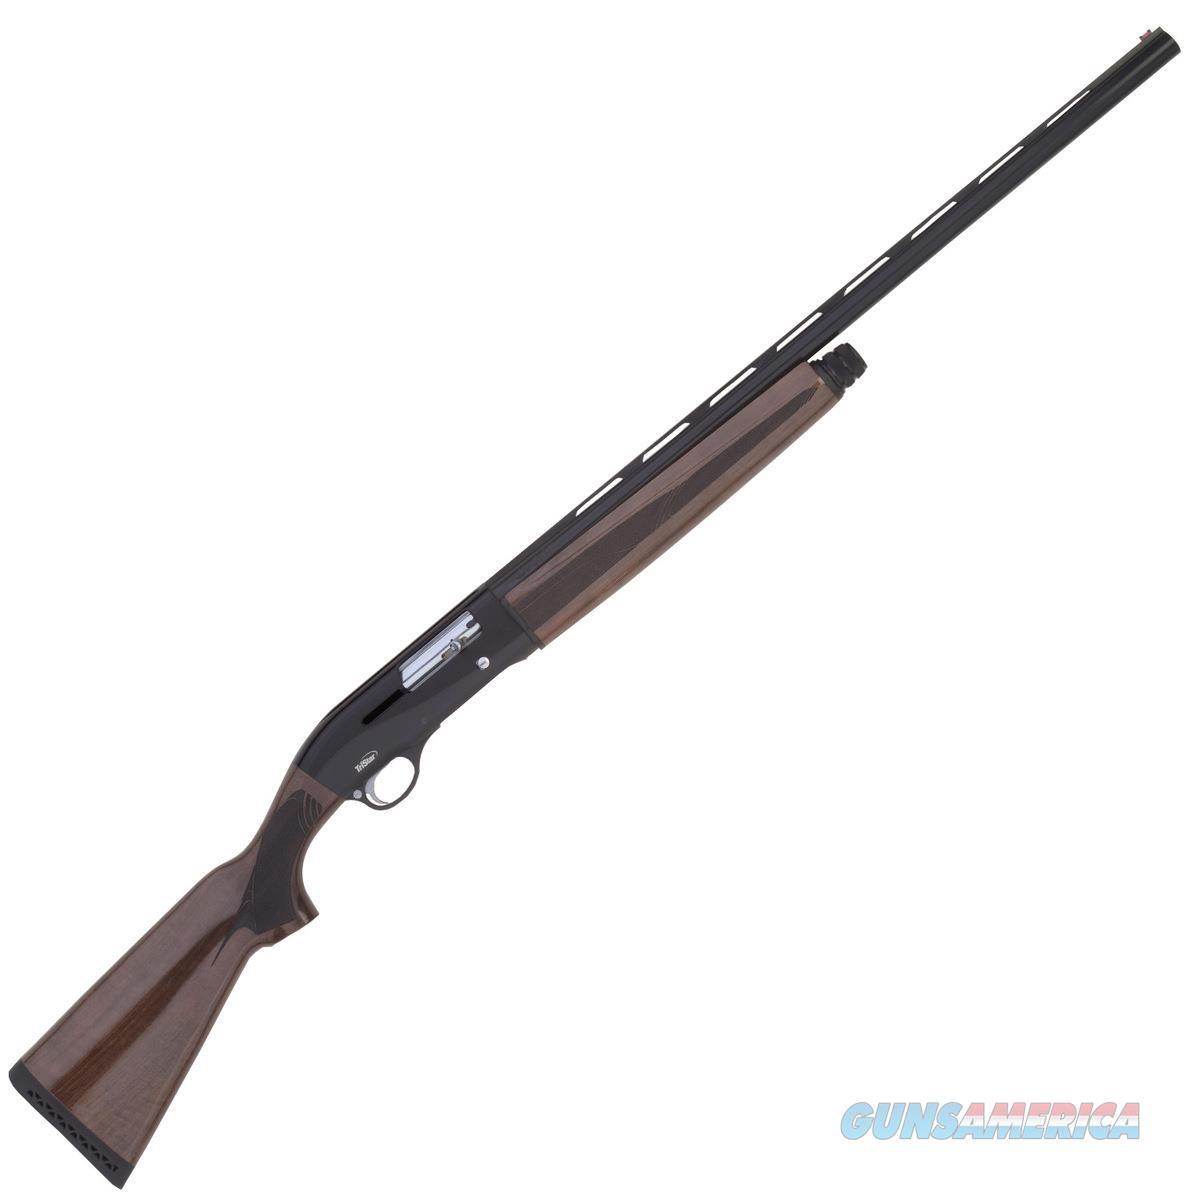 "TriStar Arms Raptor HP 2-Tone 12 Gauge 28"" 98483   Guns > Shotguns > Tristar Shotguns"